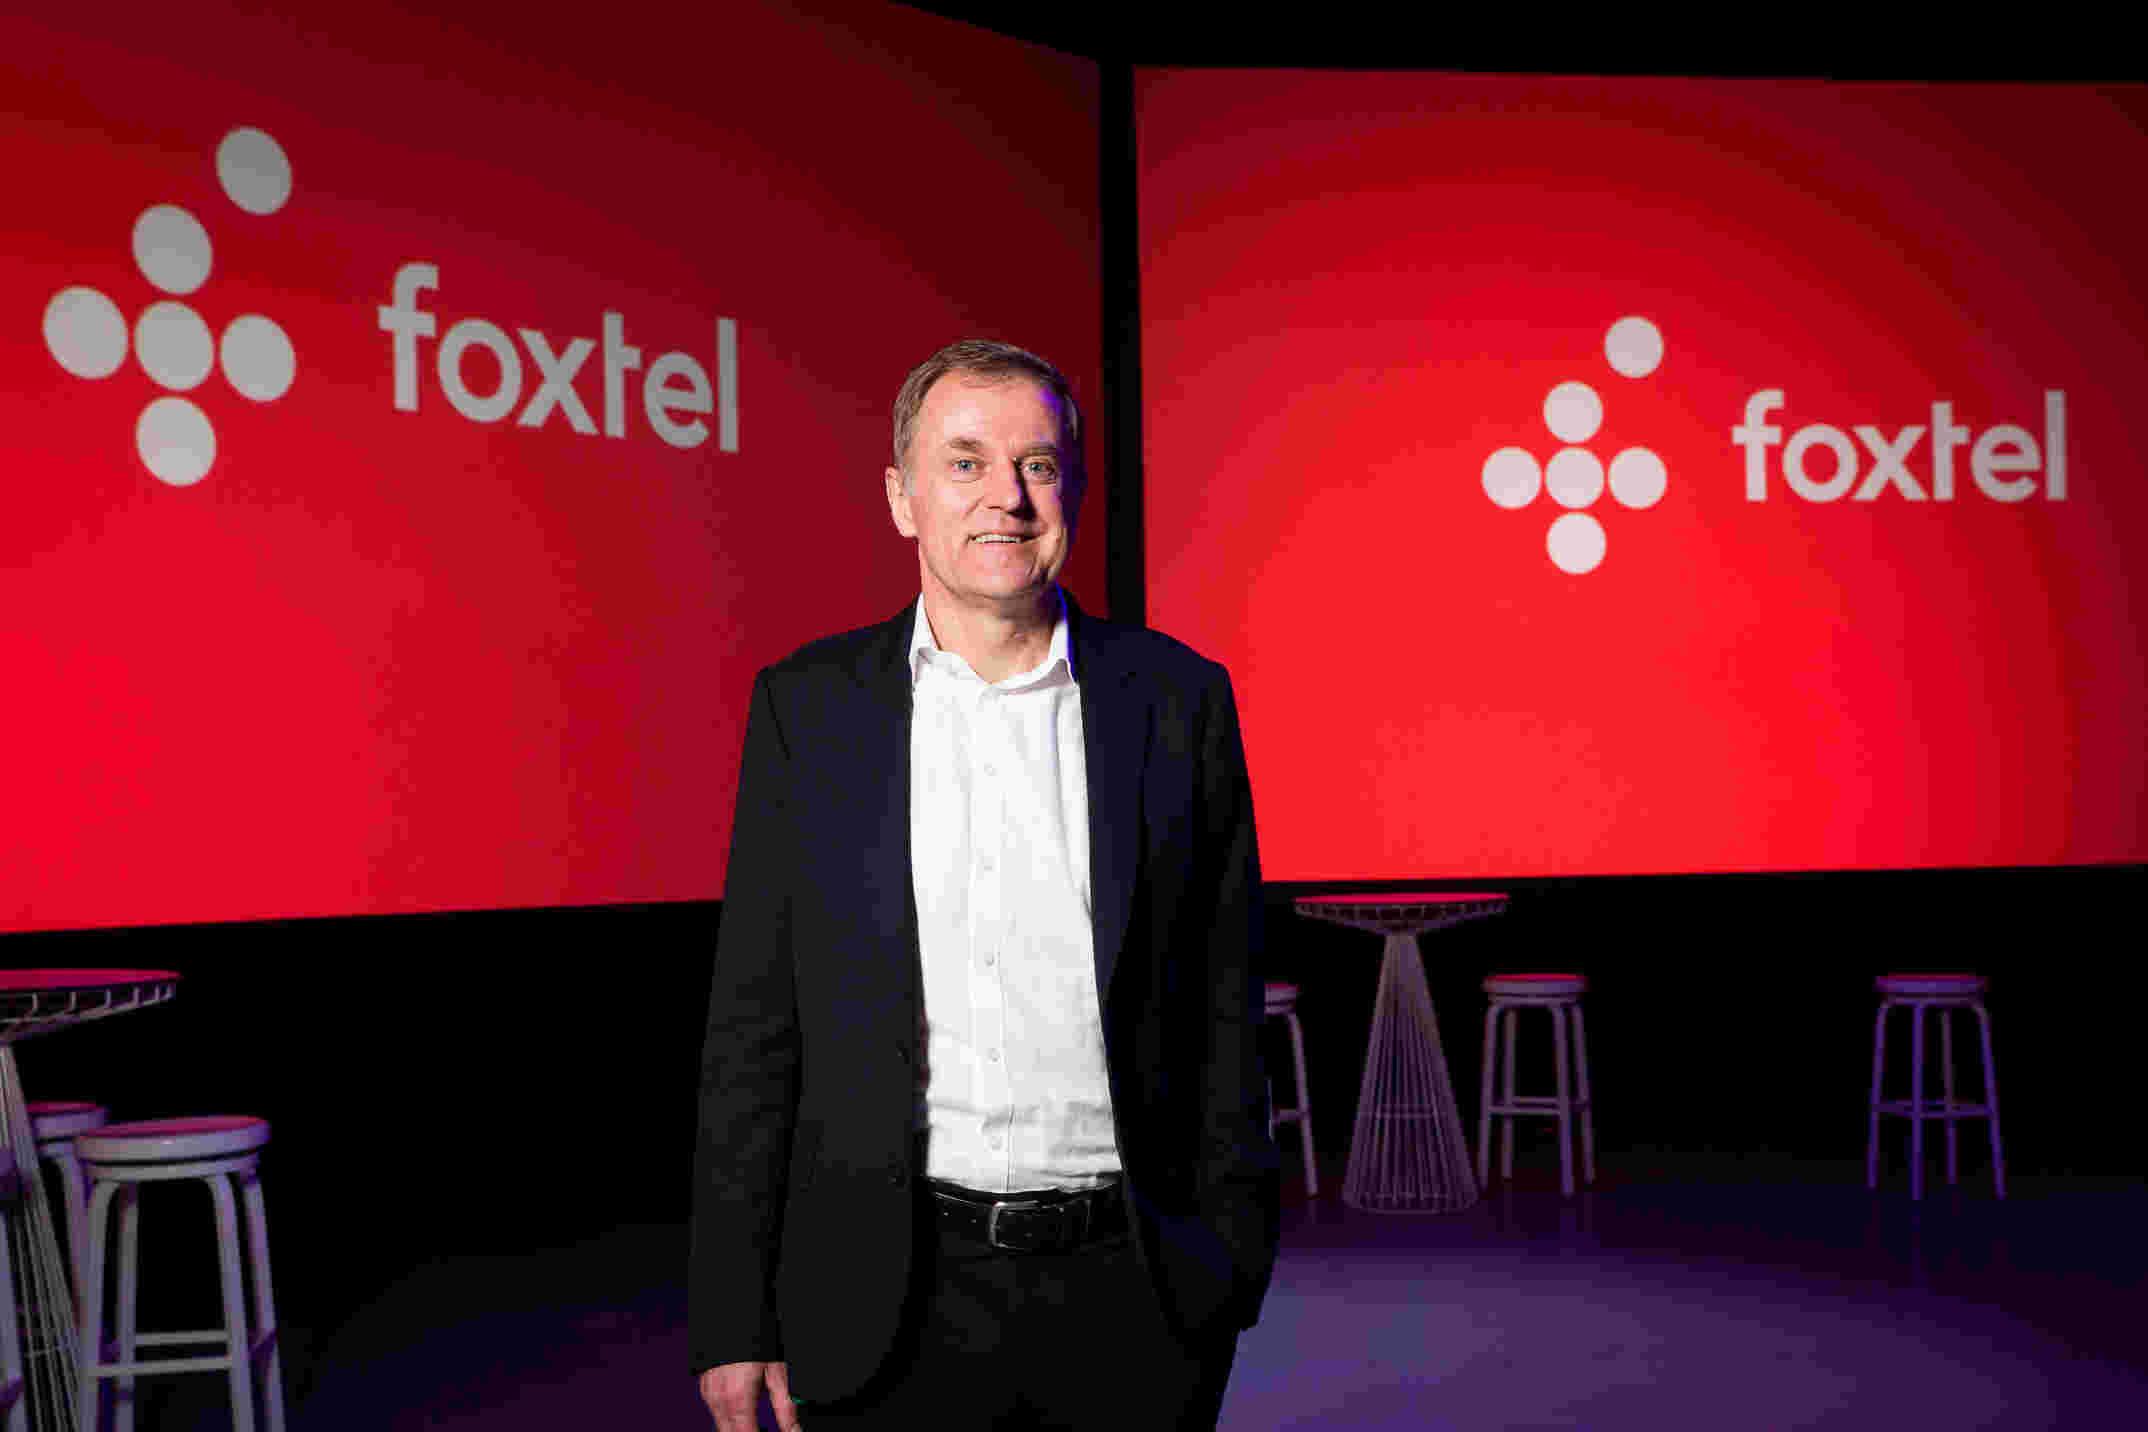 爆炸新闻:Foxtel首席执行官Peter Tonagh出口,Delany接管了